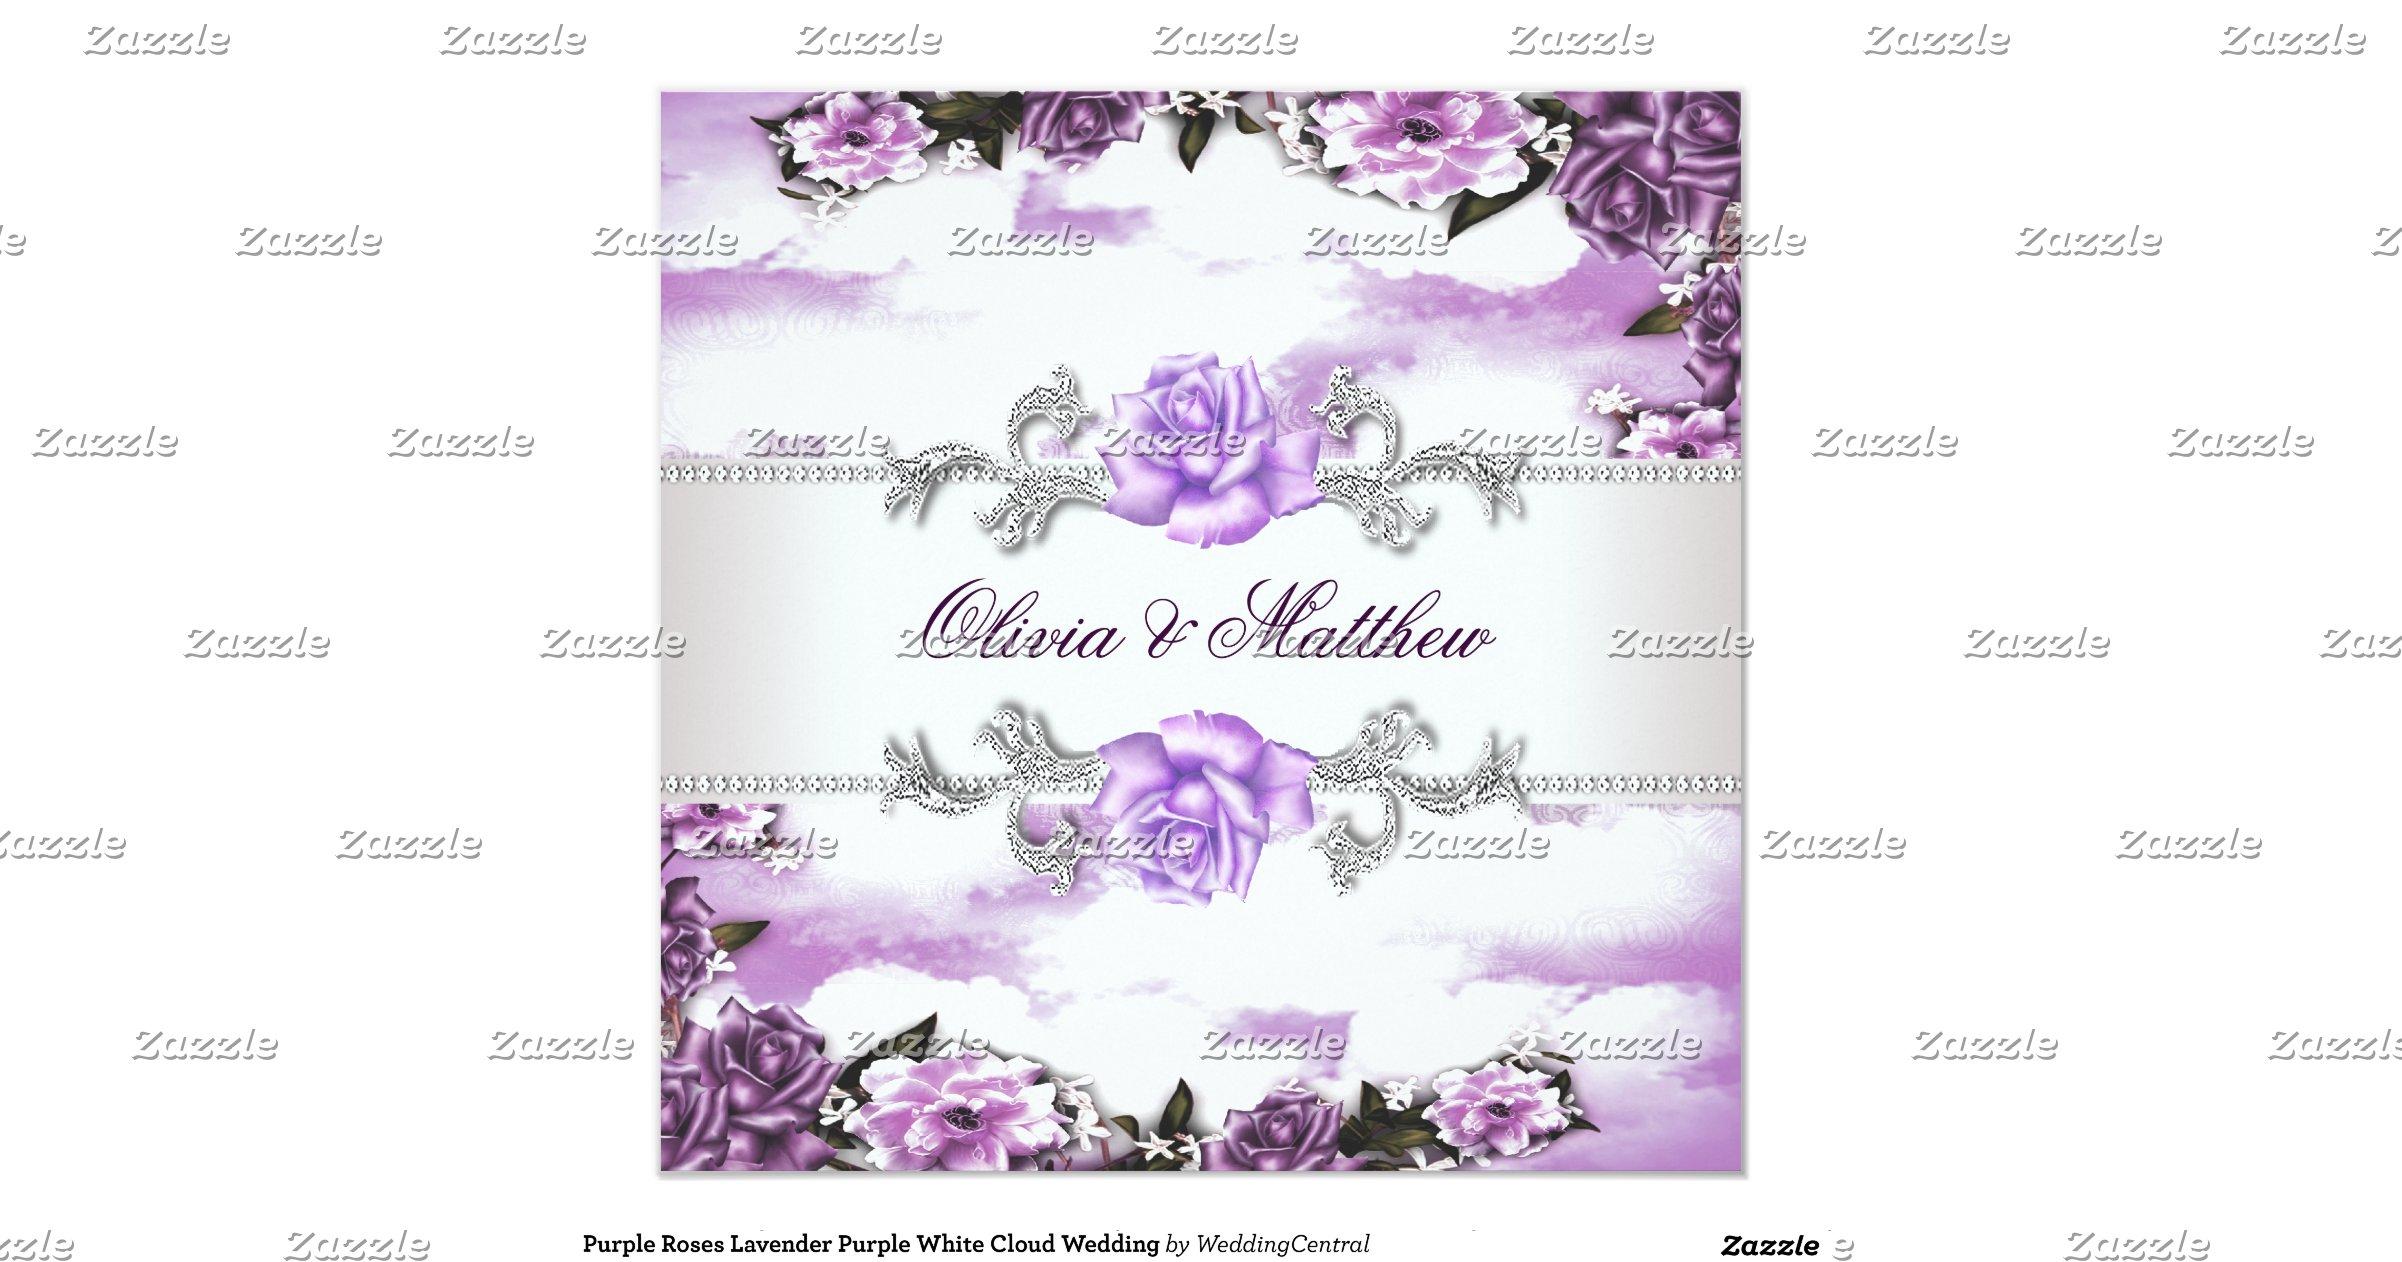 Purple Rose Wedding Invitations: Purple_roses_lavender_purple_white_cloud_wedding